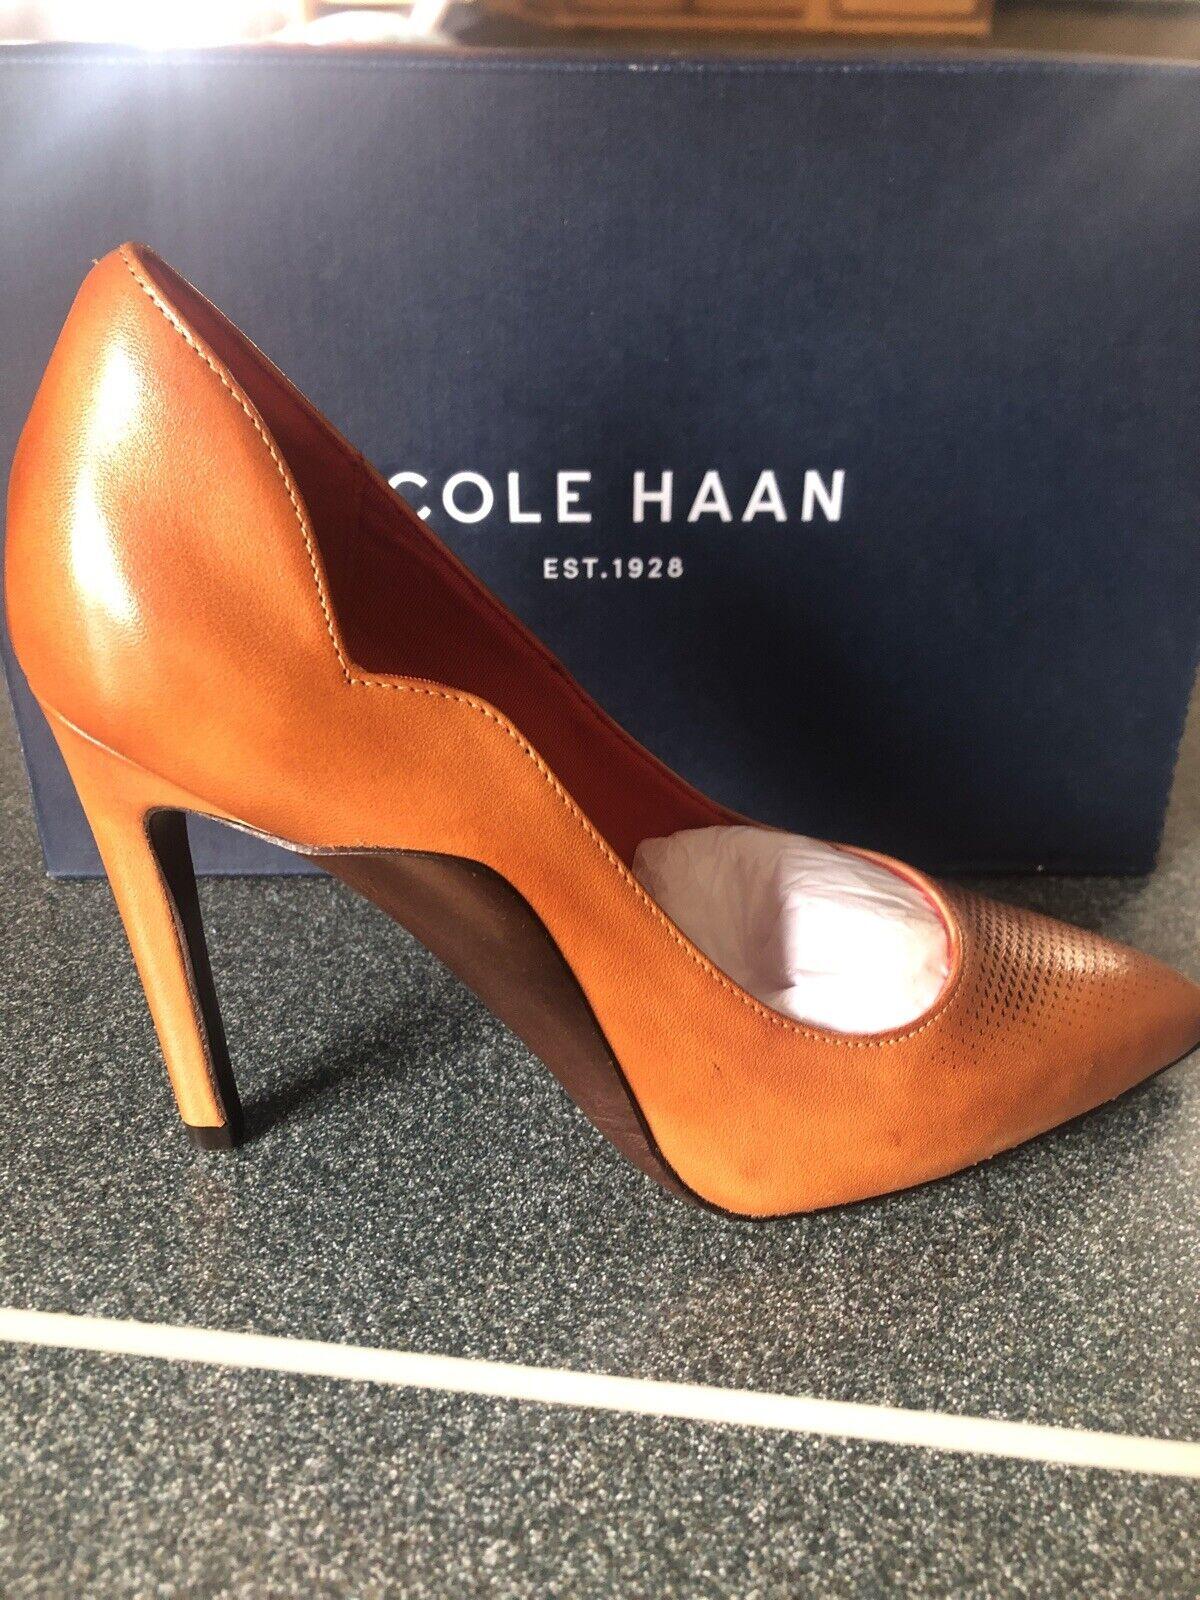 Cole Haan Nike Air Technology High